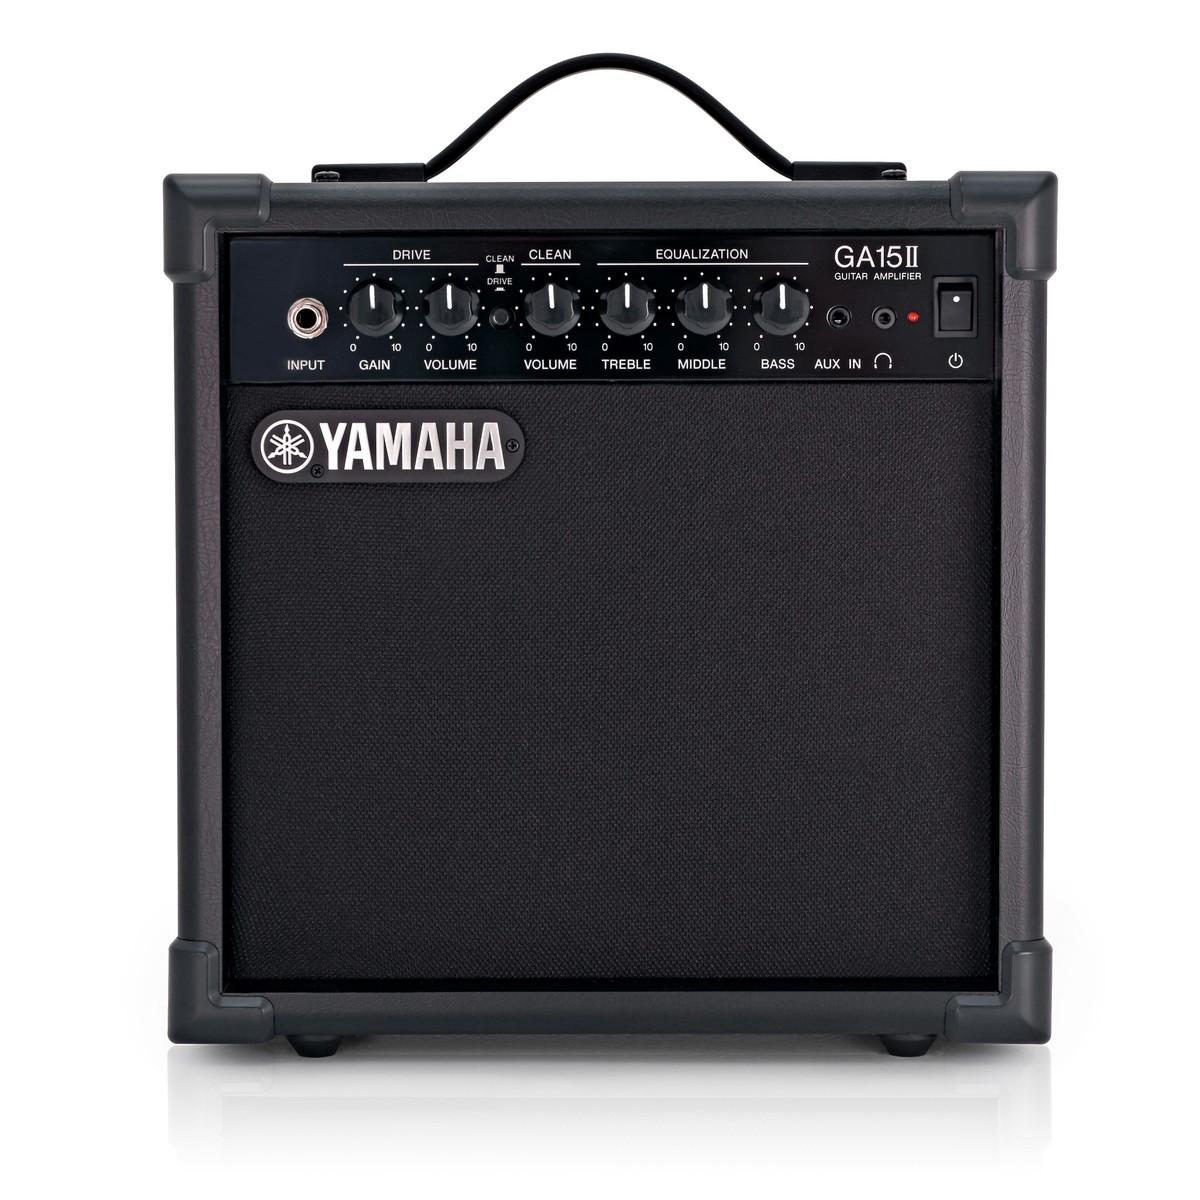 yamaha ga 15ii guitar amp at gear4music. Black Bedroom Furniture Sets. Home Design Ideas